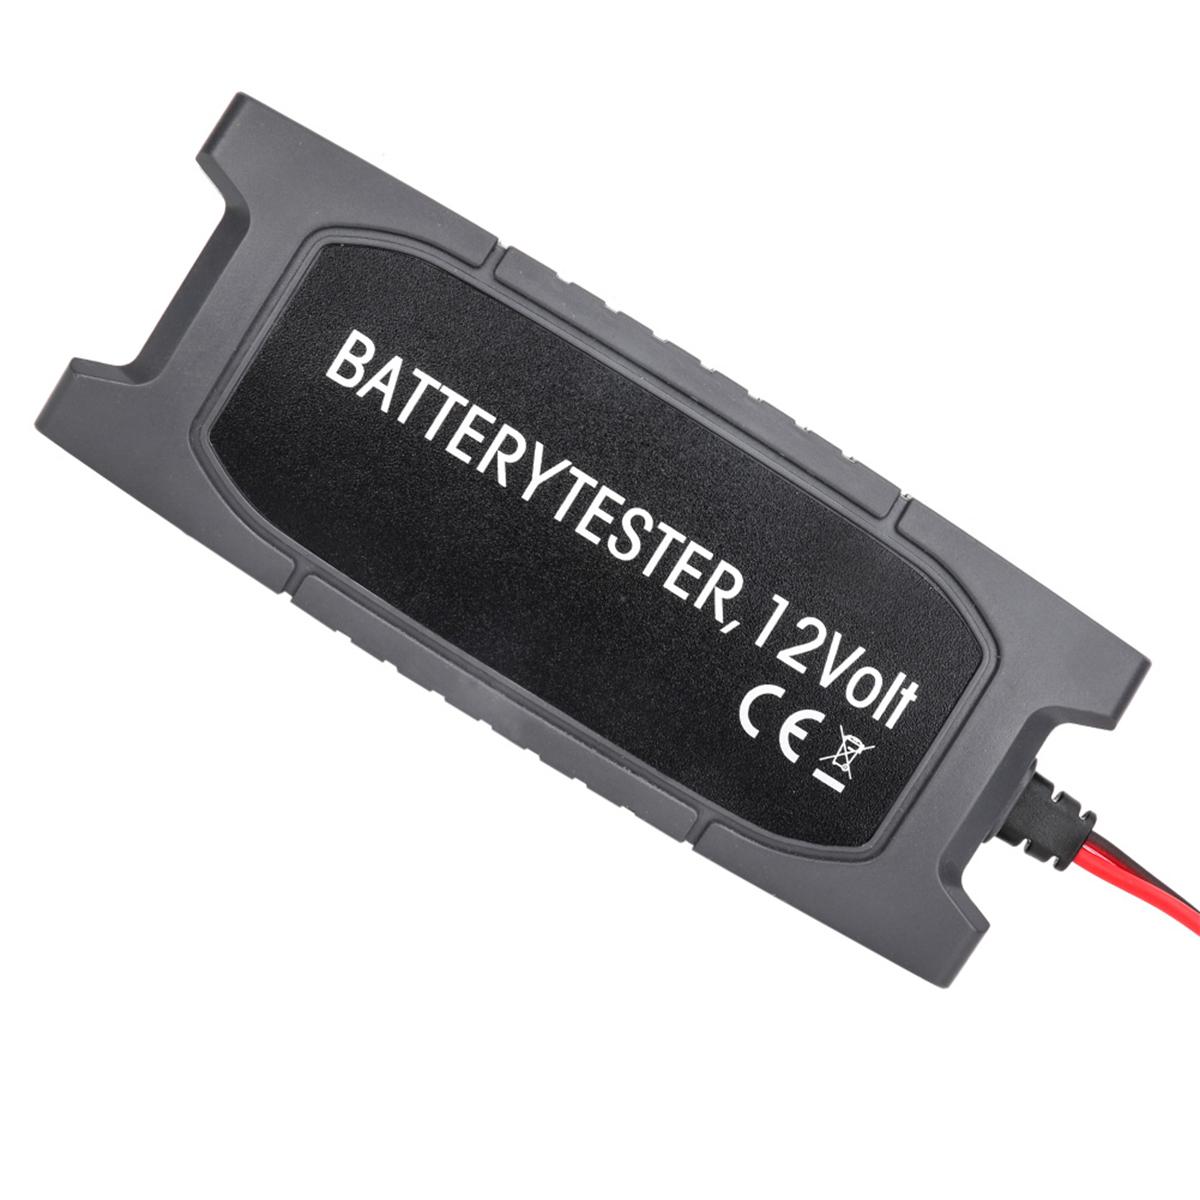 12V Батарея Тестер с 6 LED Диагностическим выводом анализатора проверки генератора Инструмент - фото 4